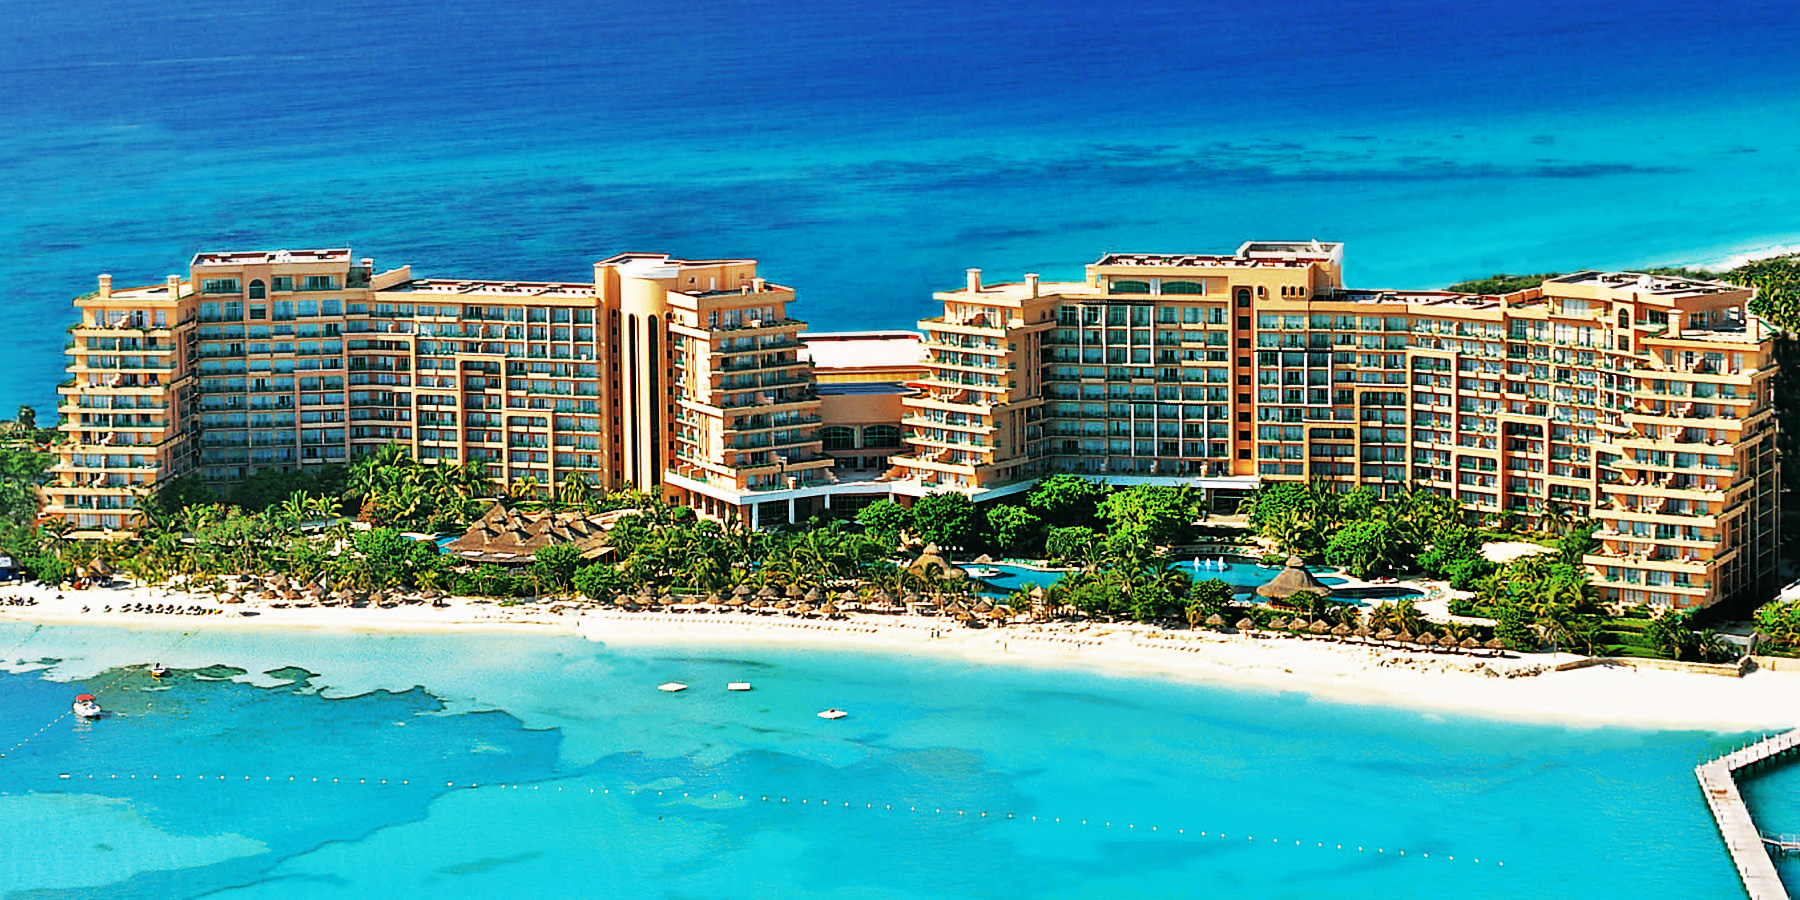 Sun Palace Cancun Tour